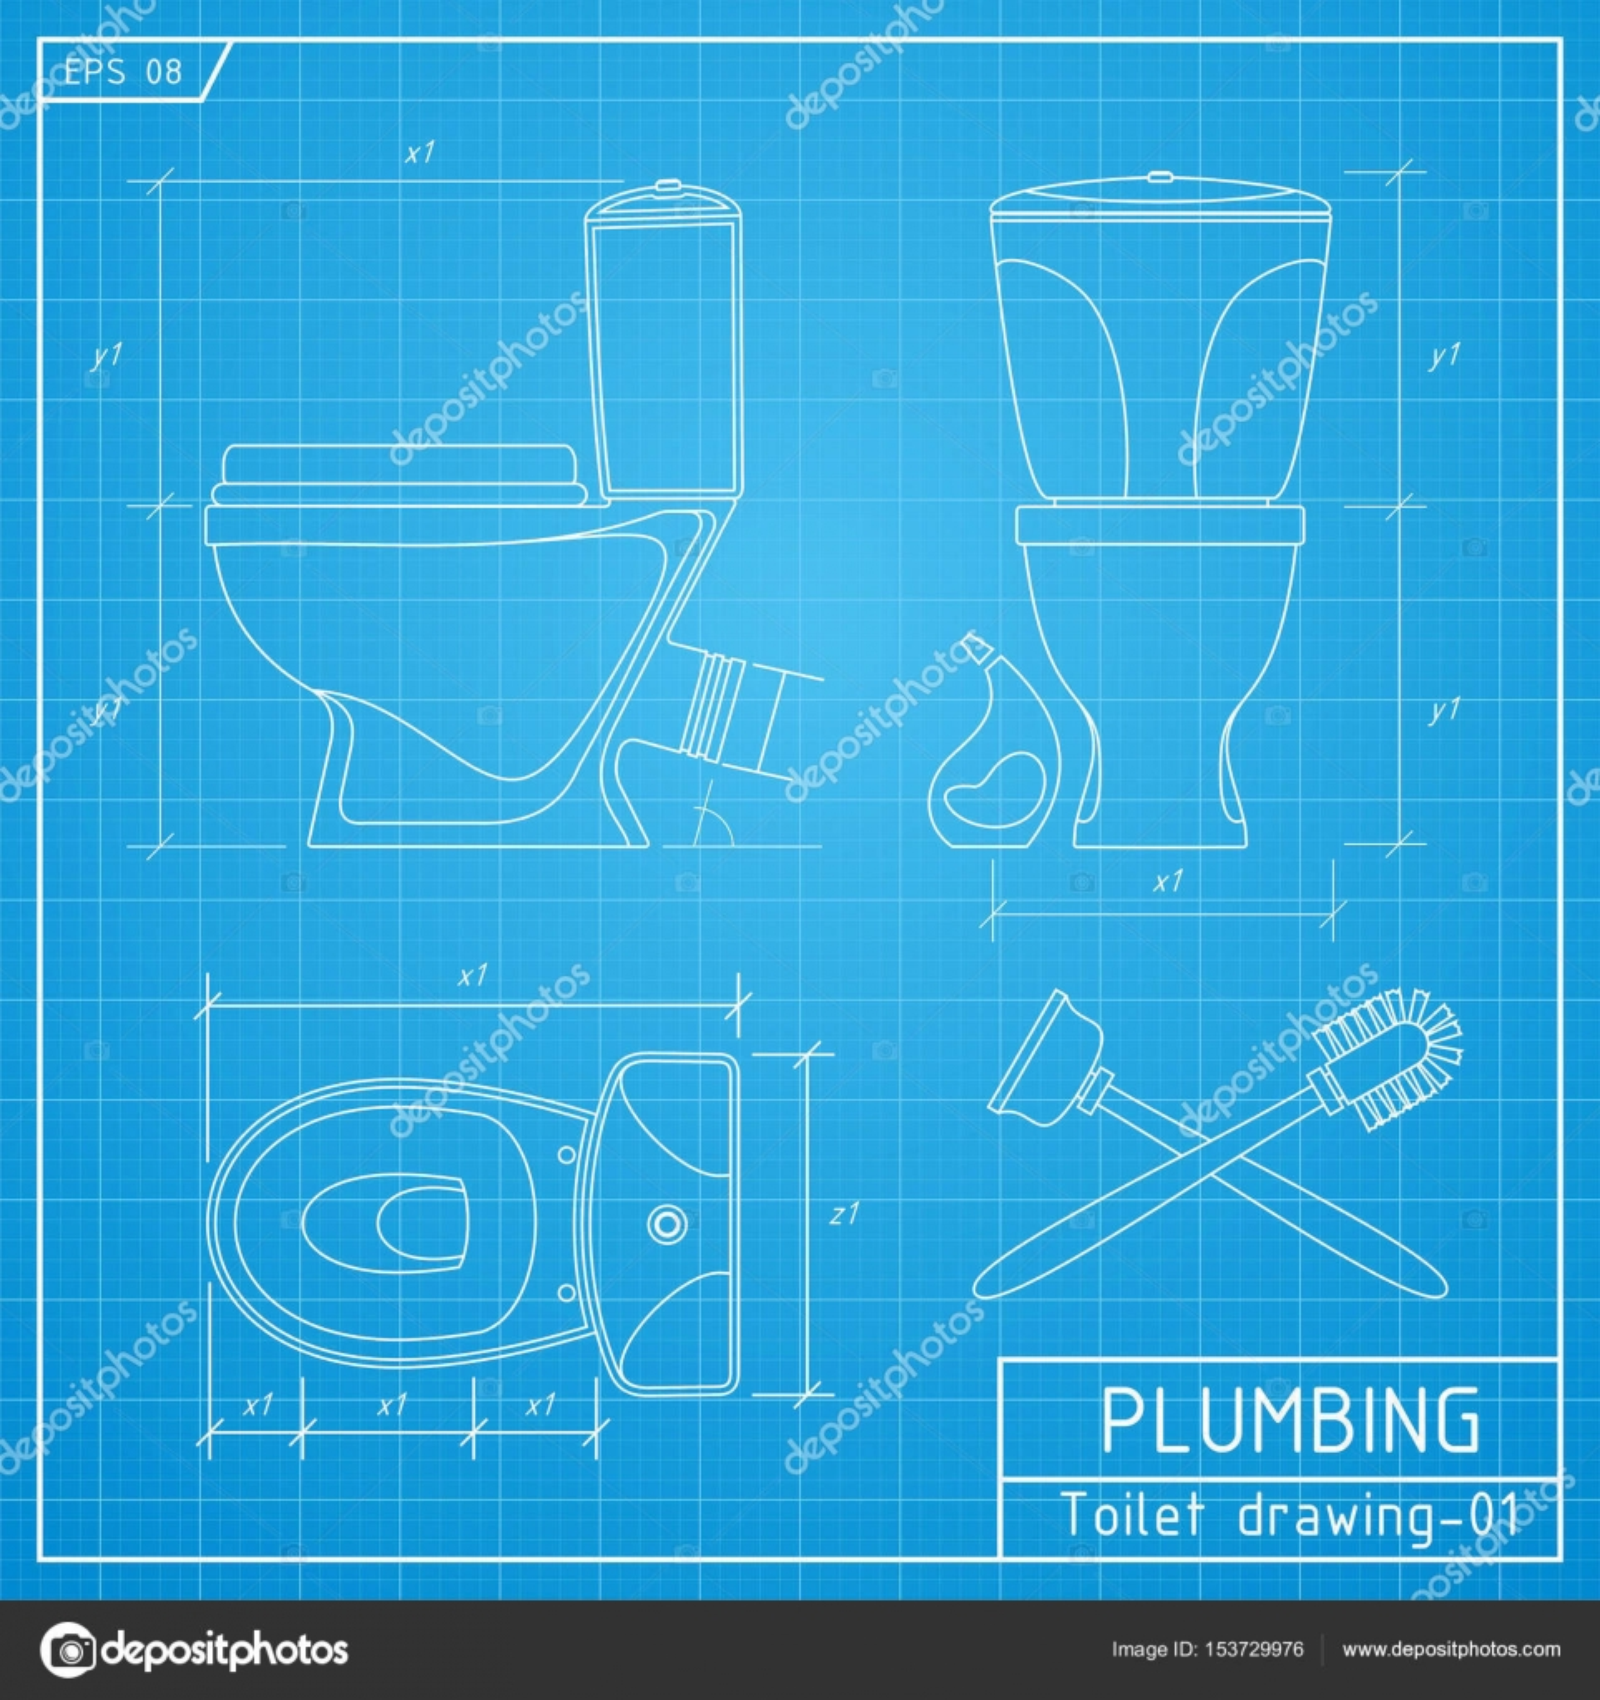 90+ Toilet Bowl Drawing Top View - Toilet Bowl Drawing ...